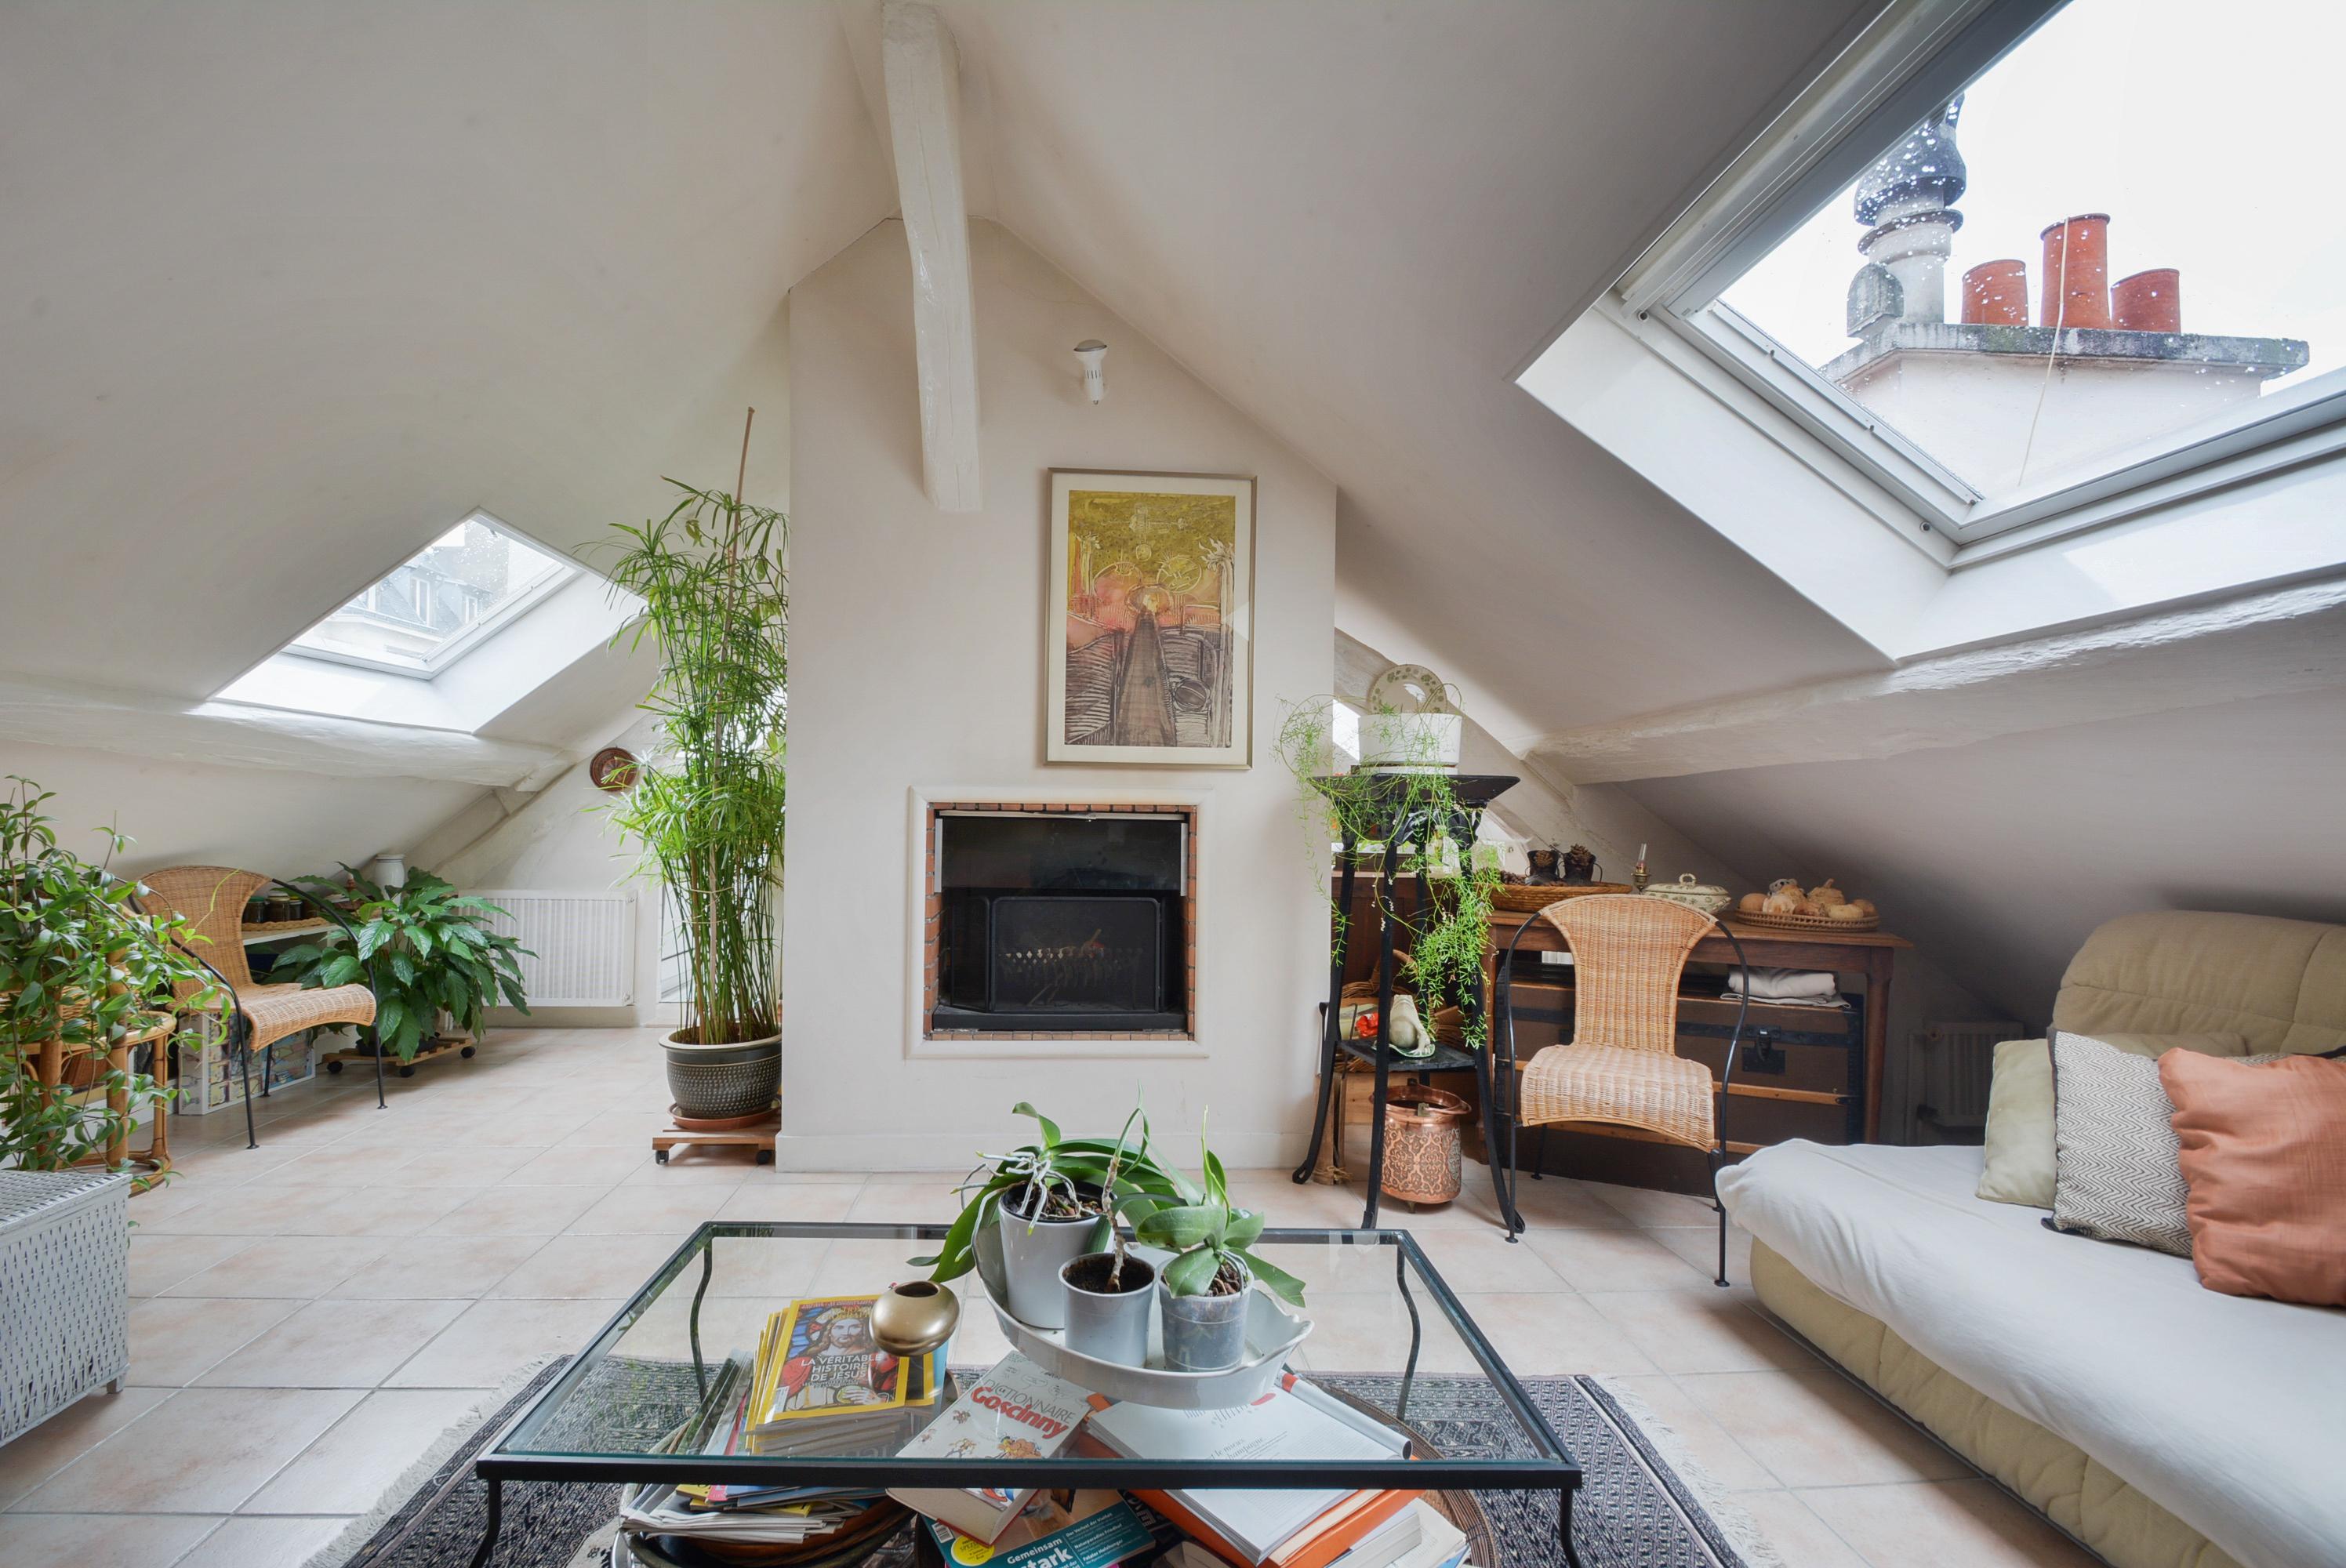 Duplex en dernier étage # rue de Bourgogne # un jardin suspendu